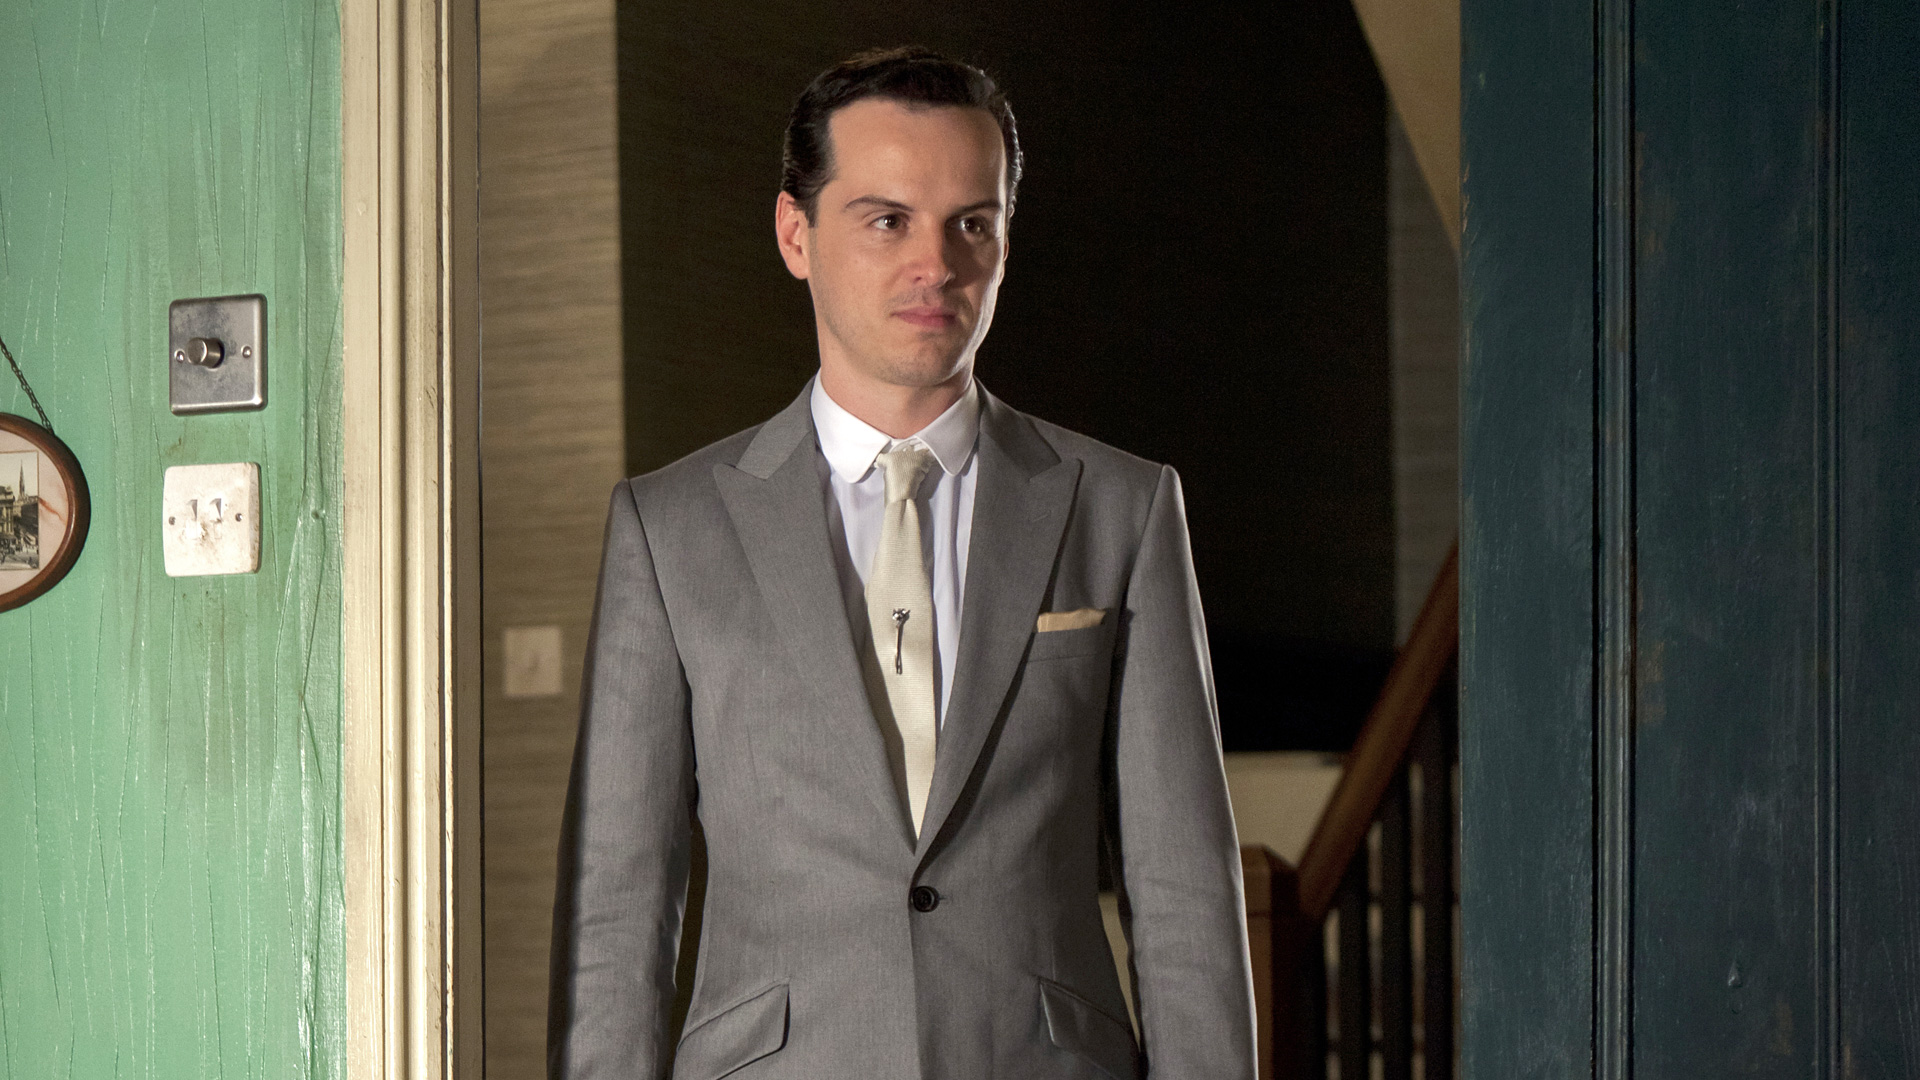 Madison : Jim moriarty in sherlock series